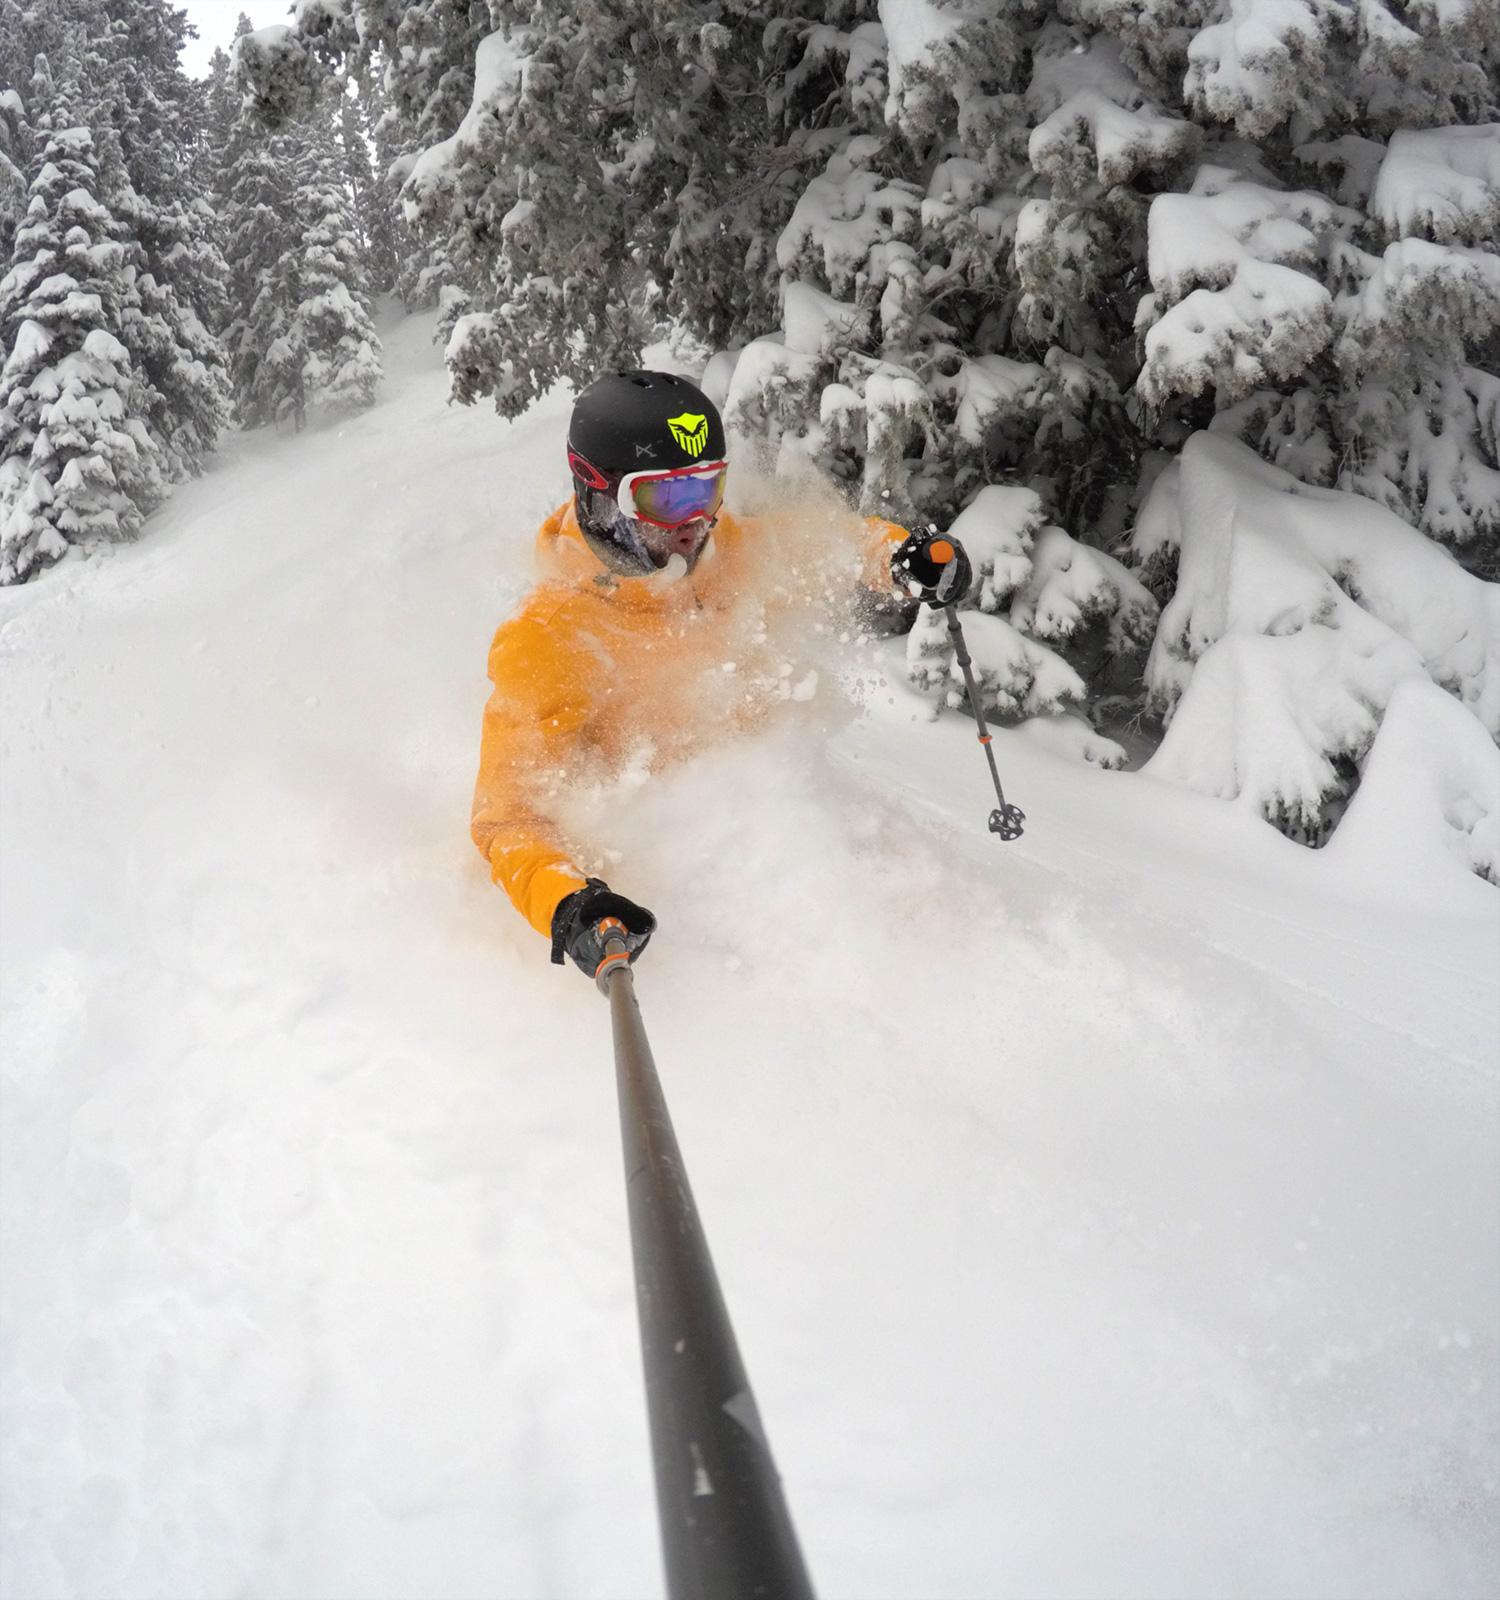 burke-alder-alta-ski-powder-pictures.jpg